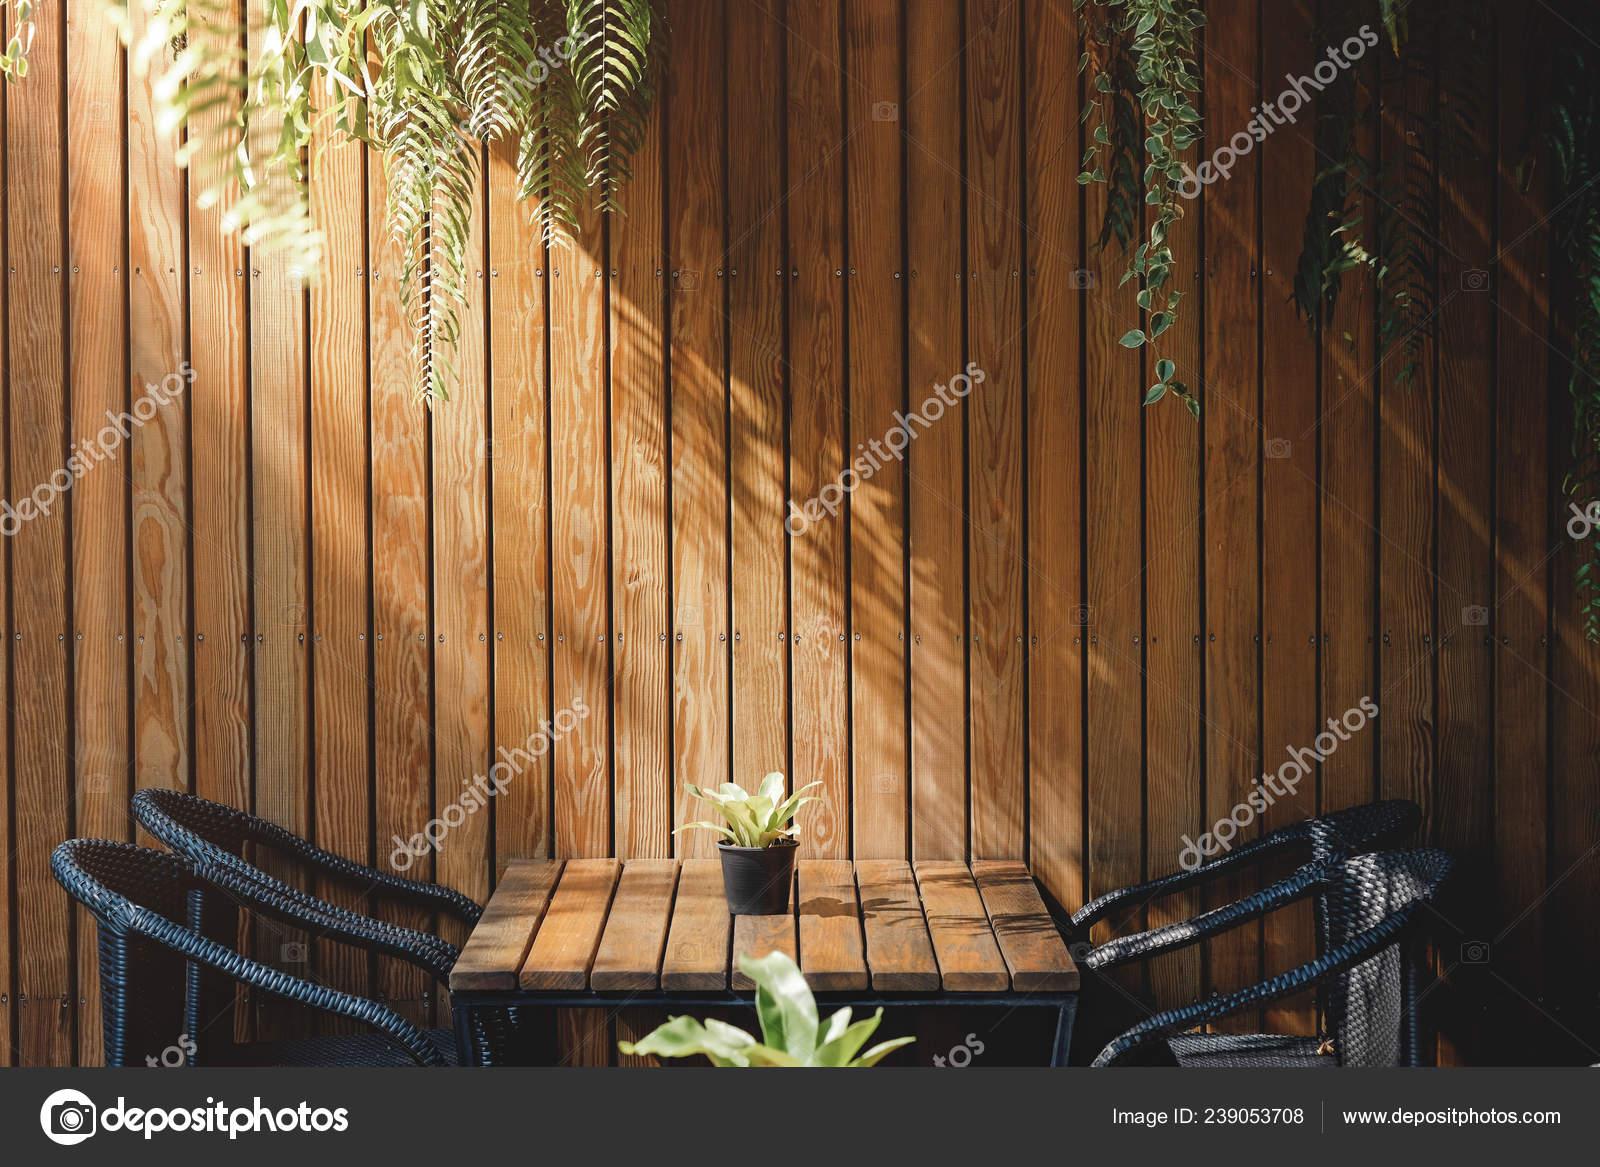 Wooden Wall Restaurant Cafe Contemporary Interior Design Natural Daylight Stock Photo C Sirinapawannapat Gmail Com 239053708